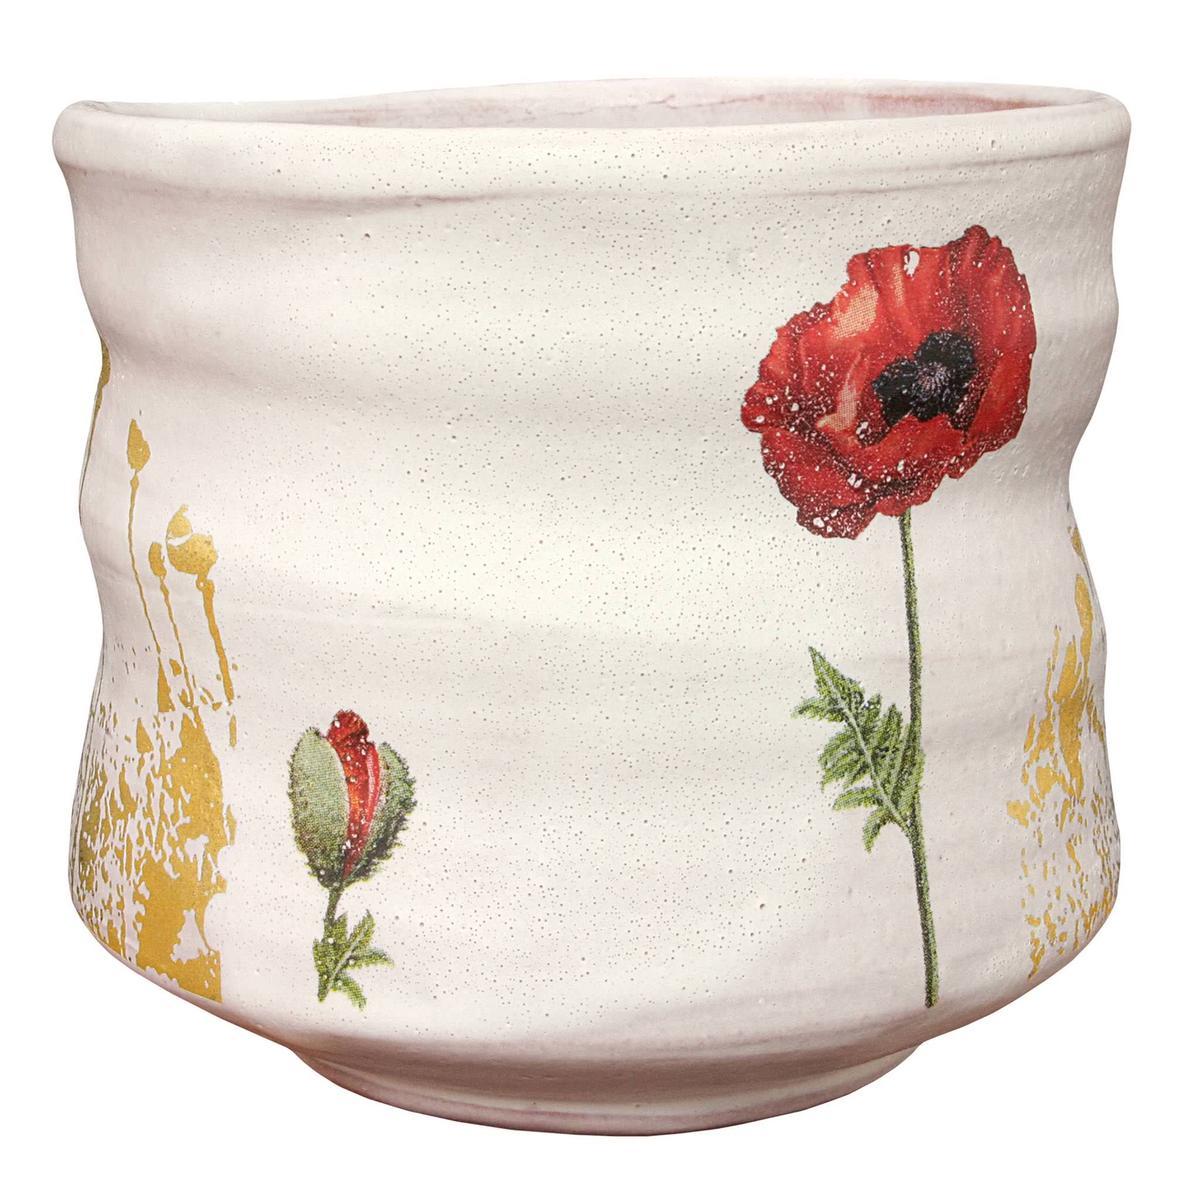 venta de esmalte para cerámica amaco Low Fire Matt Lm-11 opaque white baja temperatura